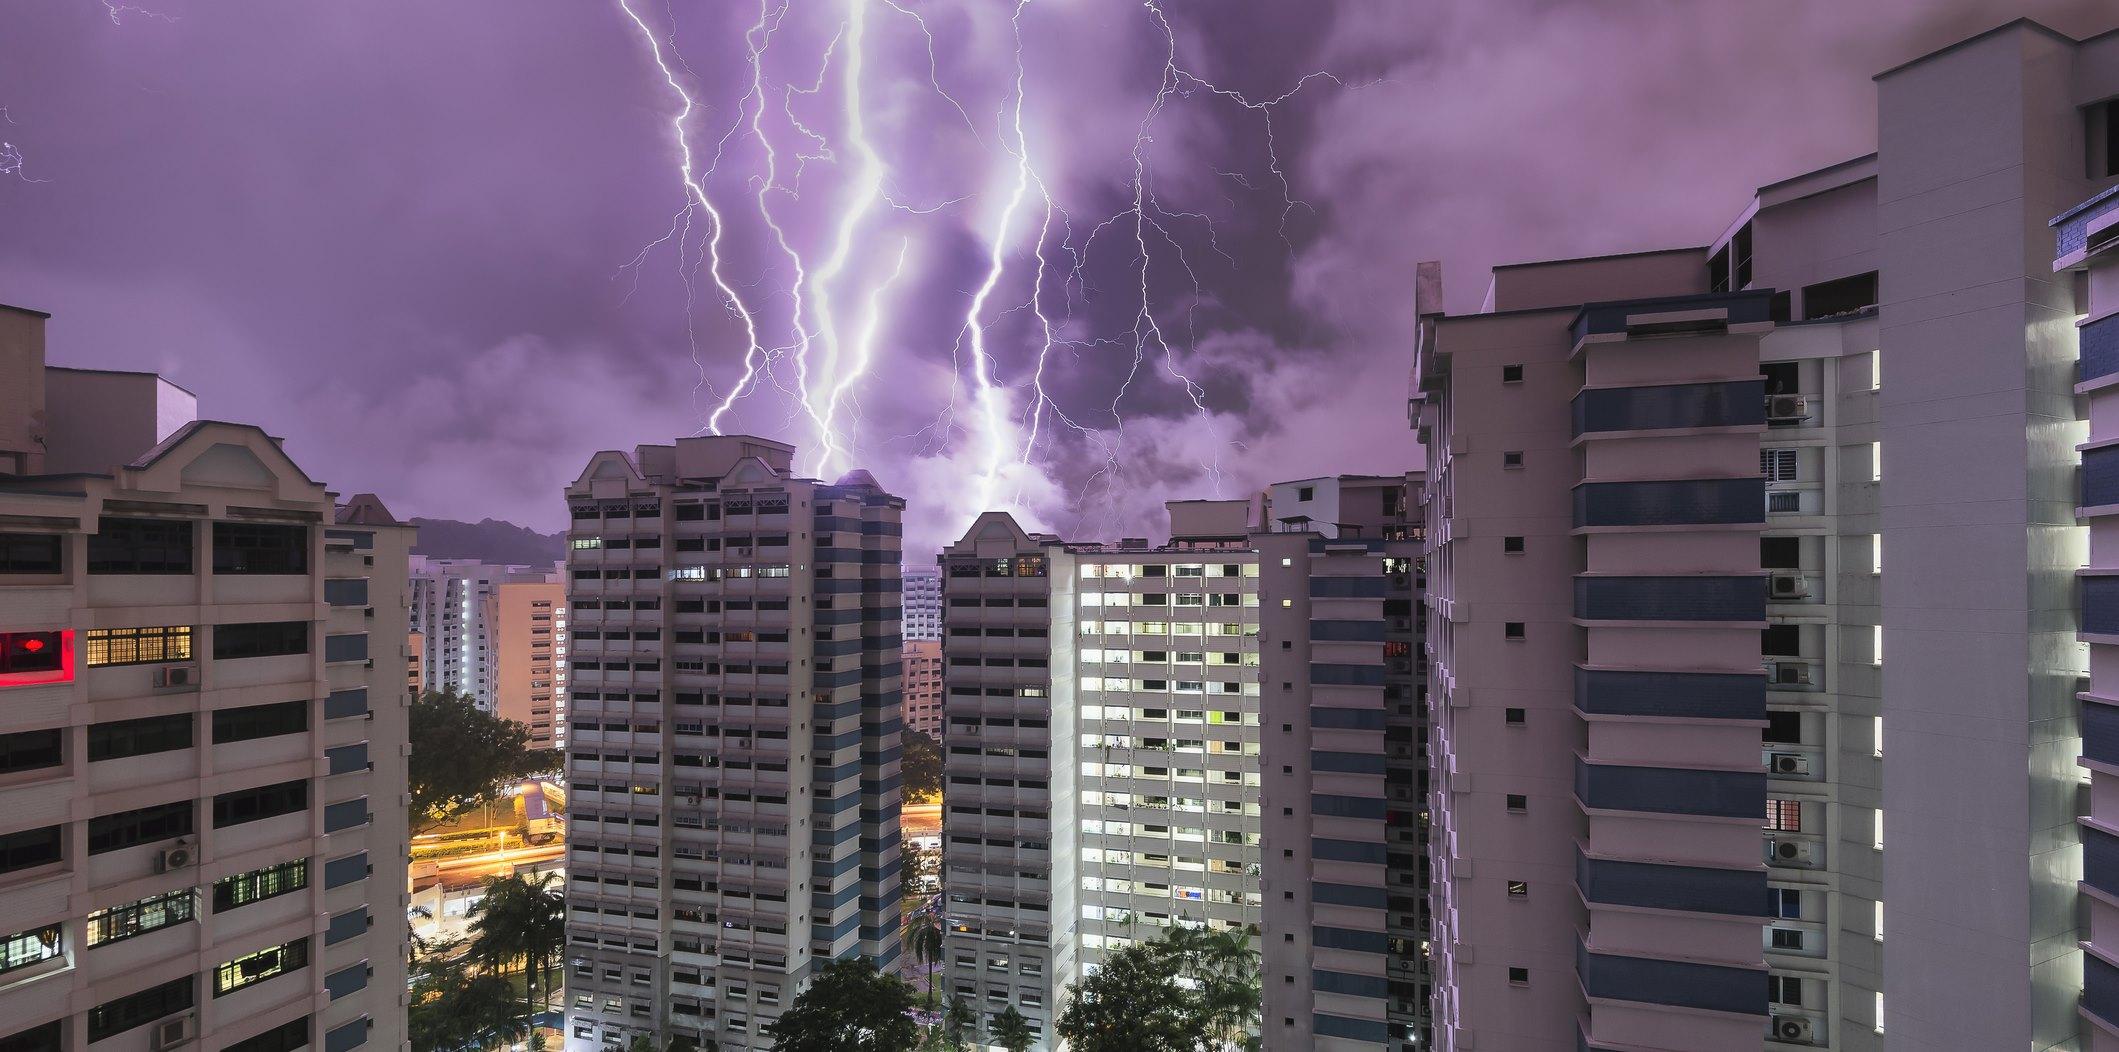 Singapore HDB flat and thunderstorm at night